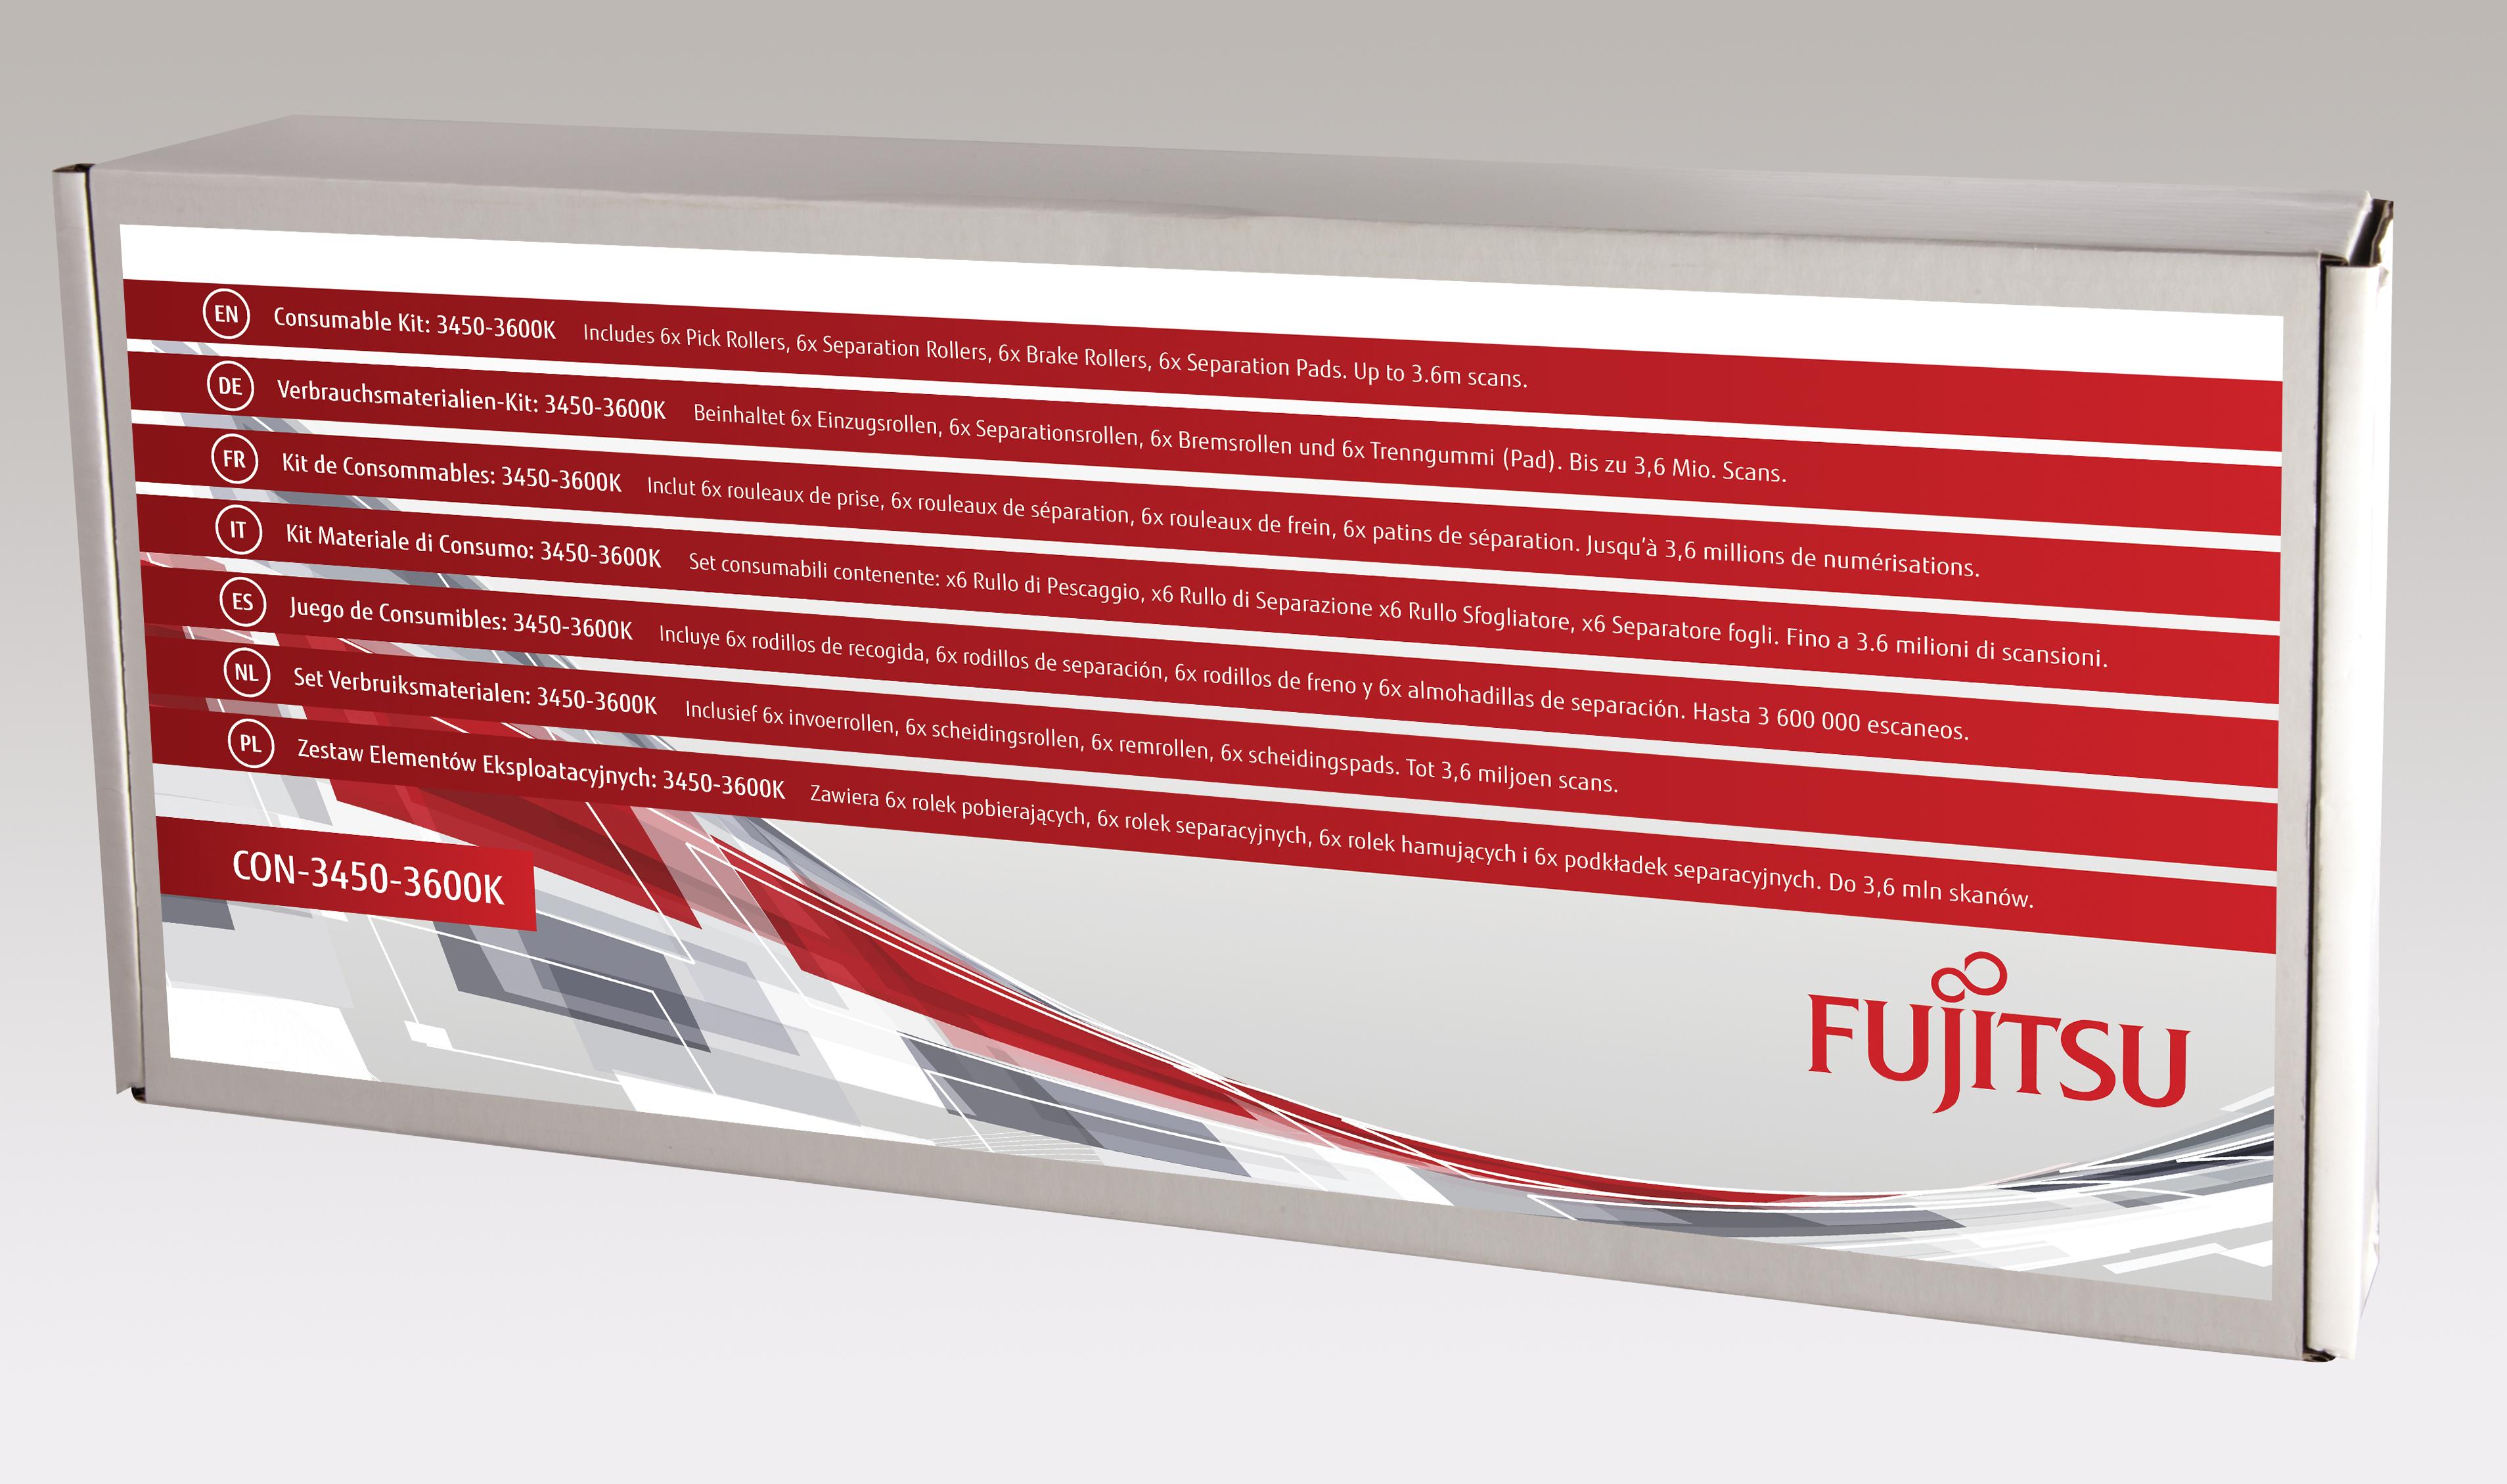 Fujitsu Consumable Kit: 3450-3600K - Scanner